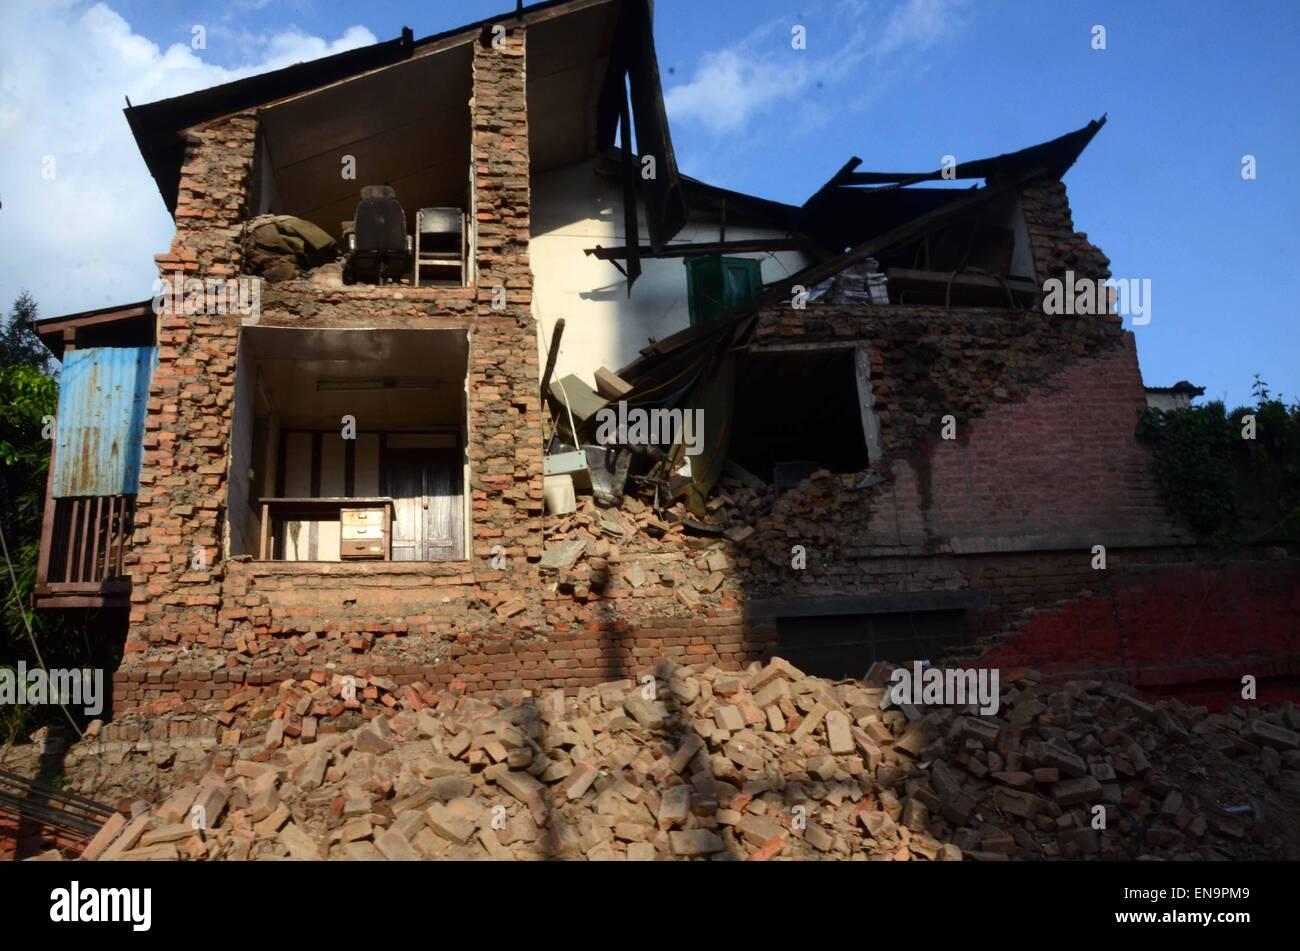 Kathmandu, Nepal  30th Apr, 2015  Many buildings and houses have